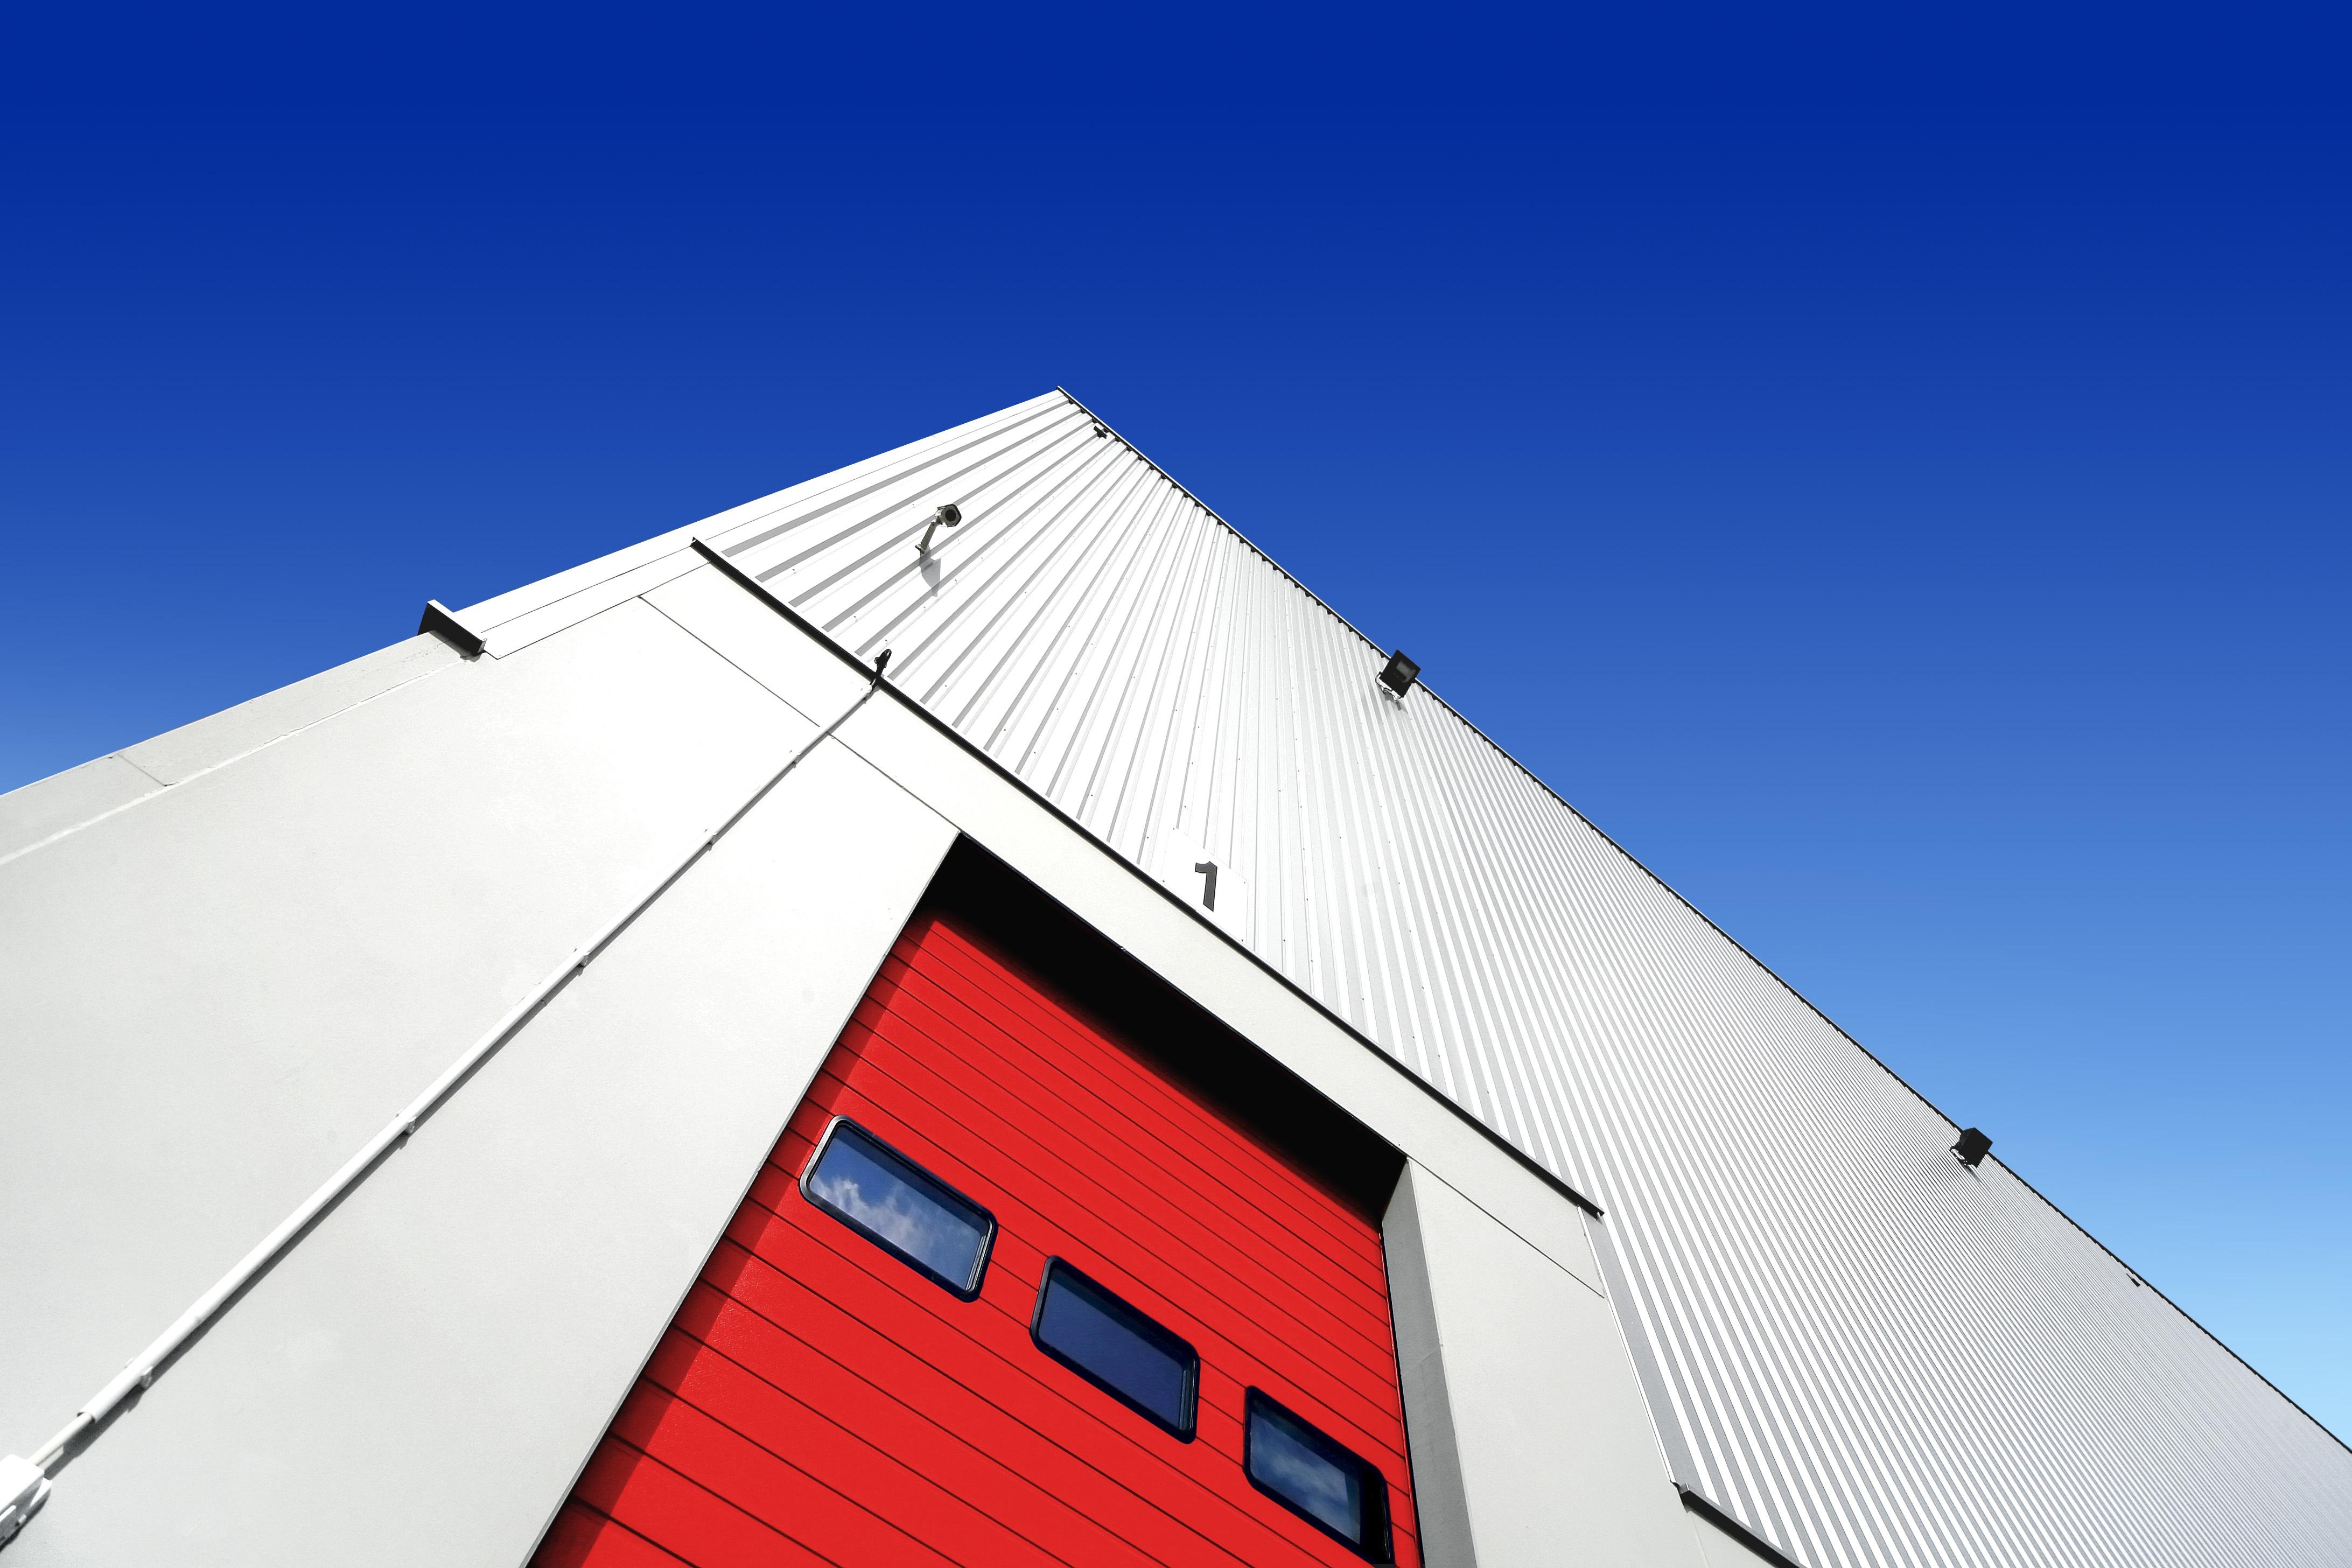 Industrial_Warehouse_Exterior_shutterstock_141083665_ML-1.jpg